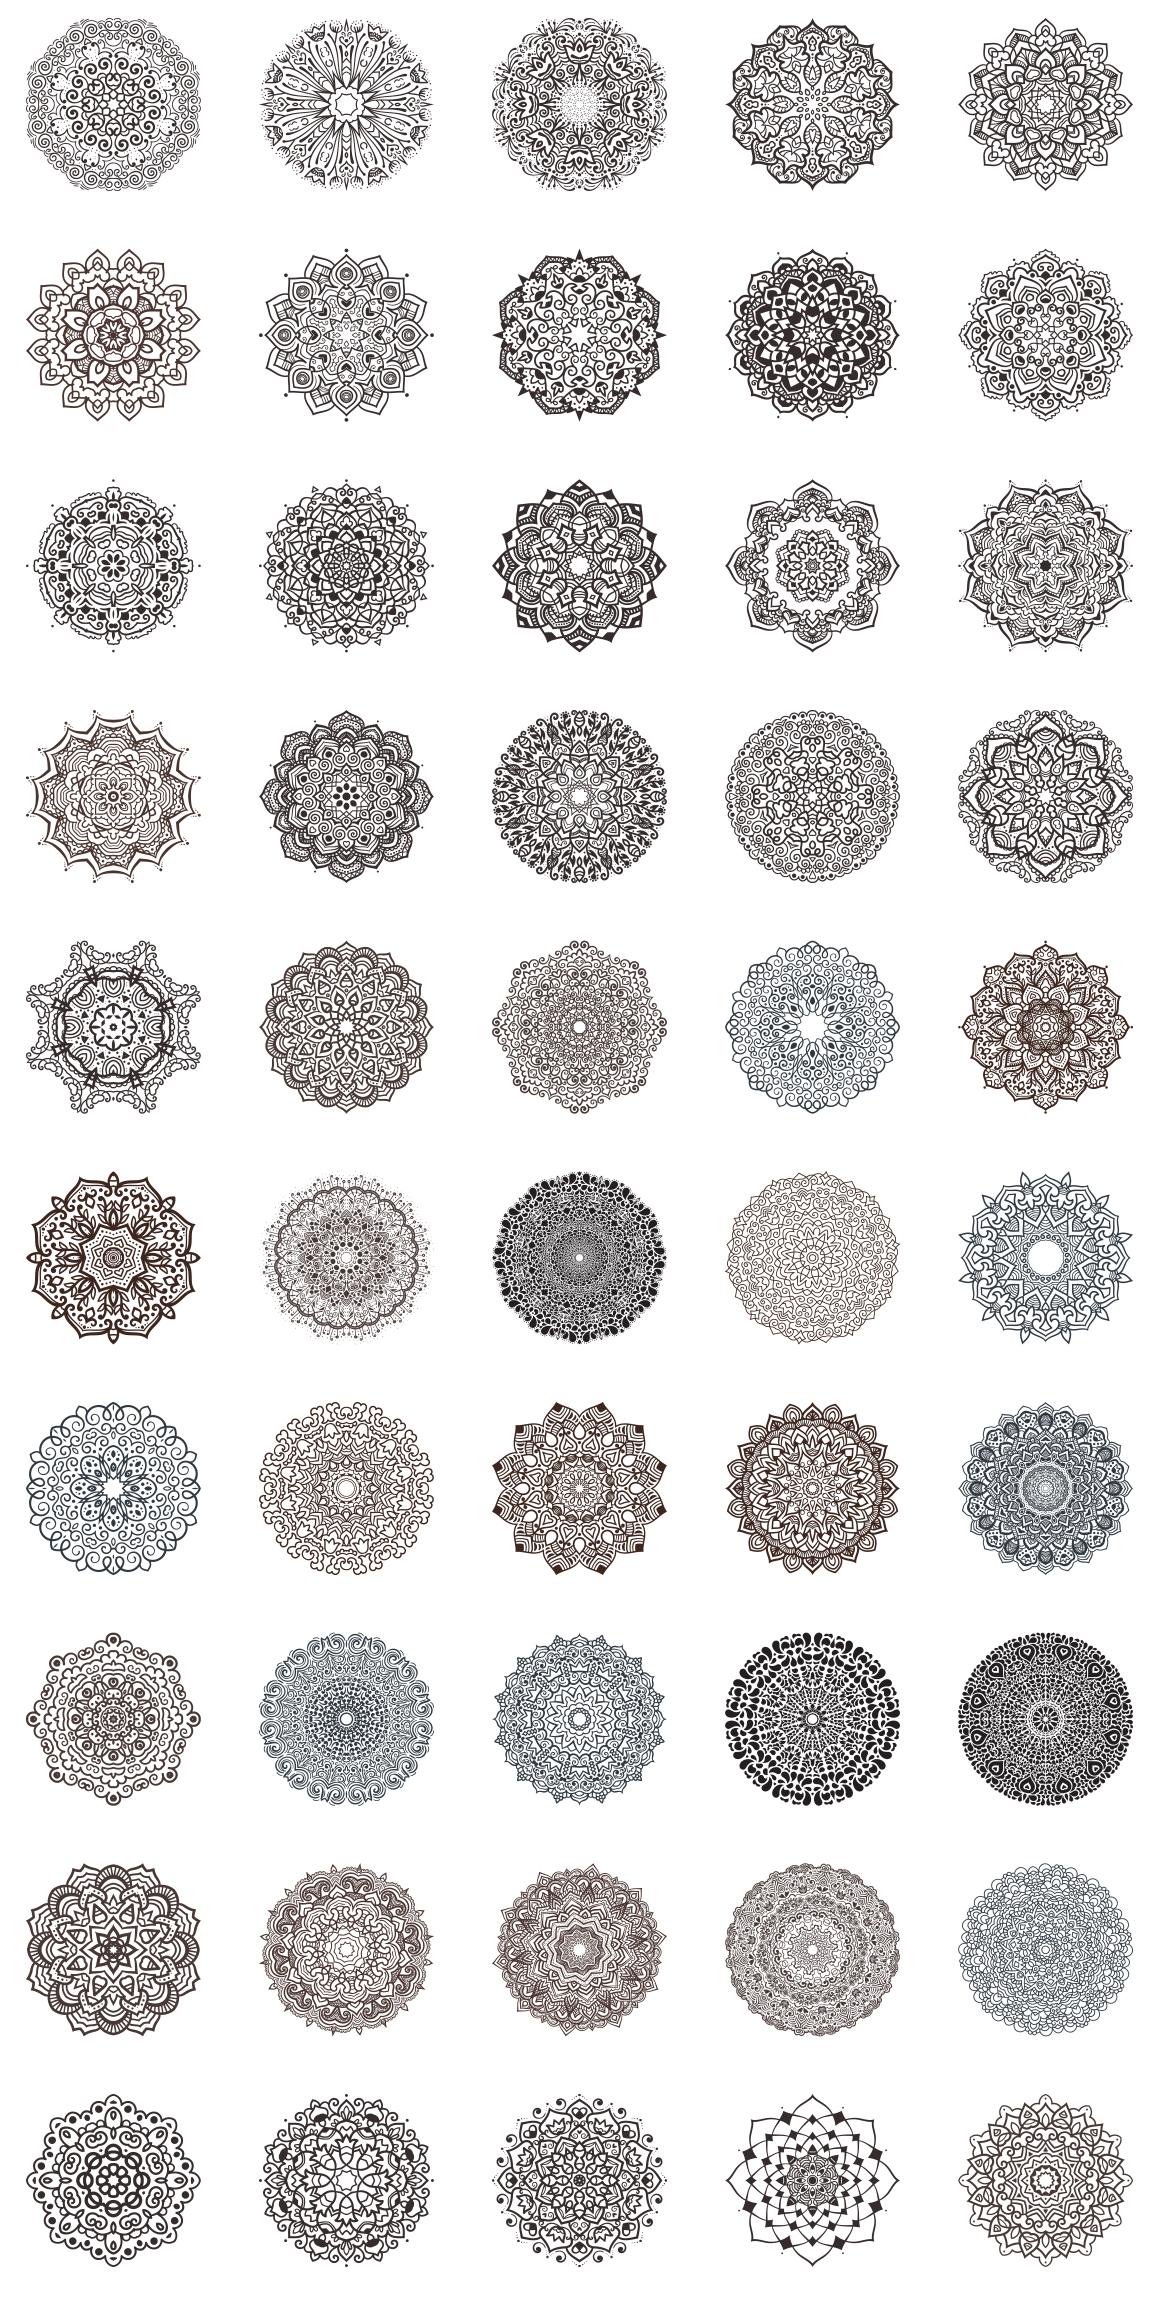 100 Vector Mandalas, Round Ornaments example image 2